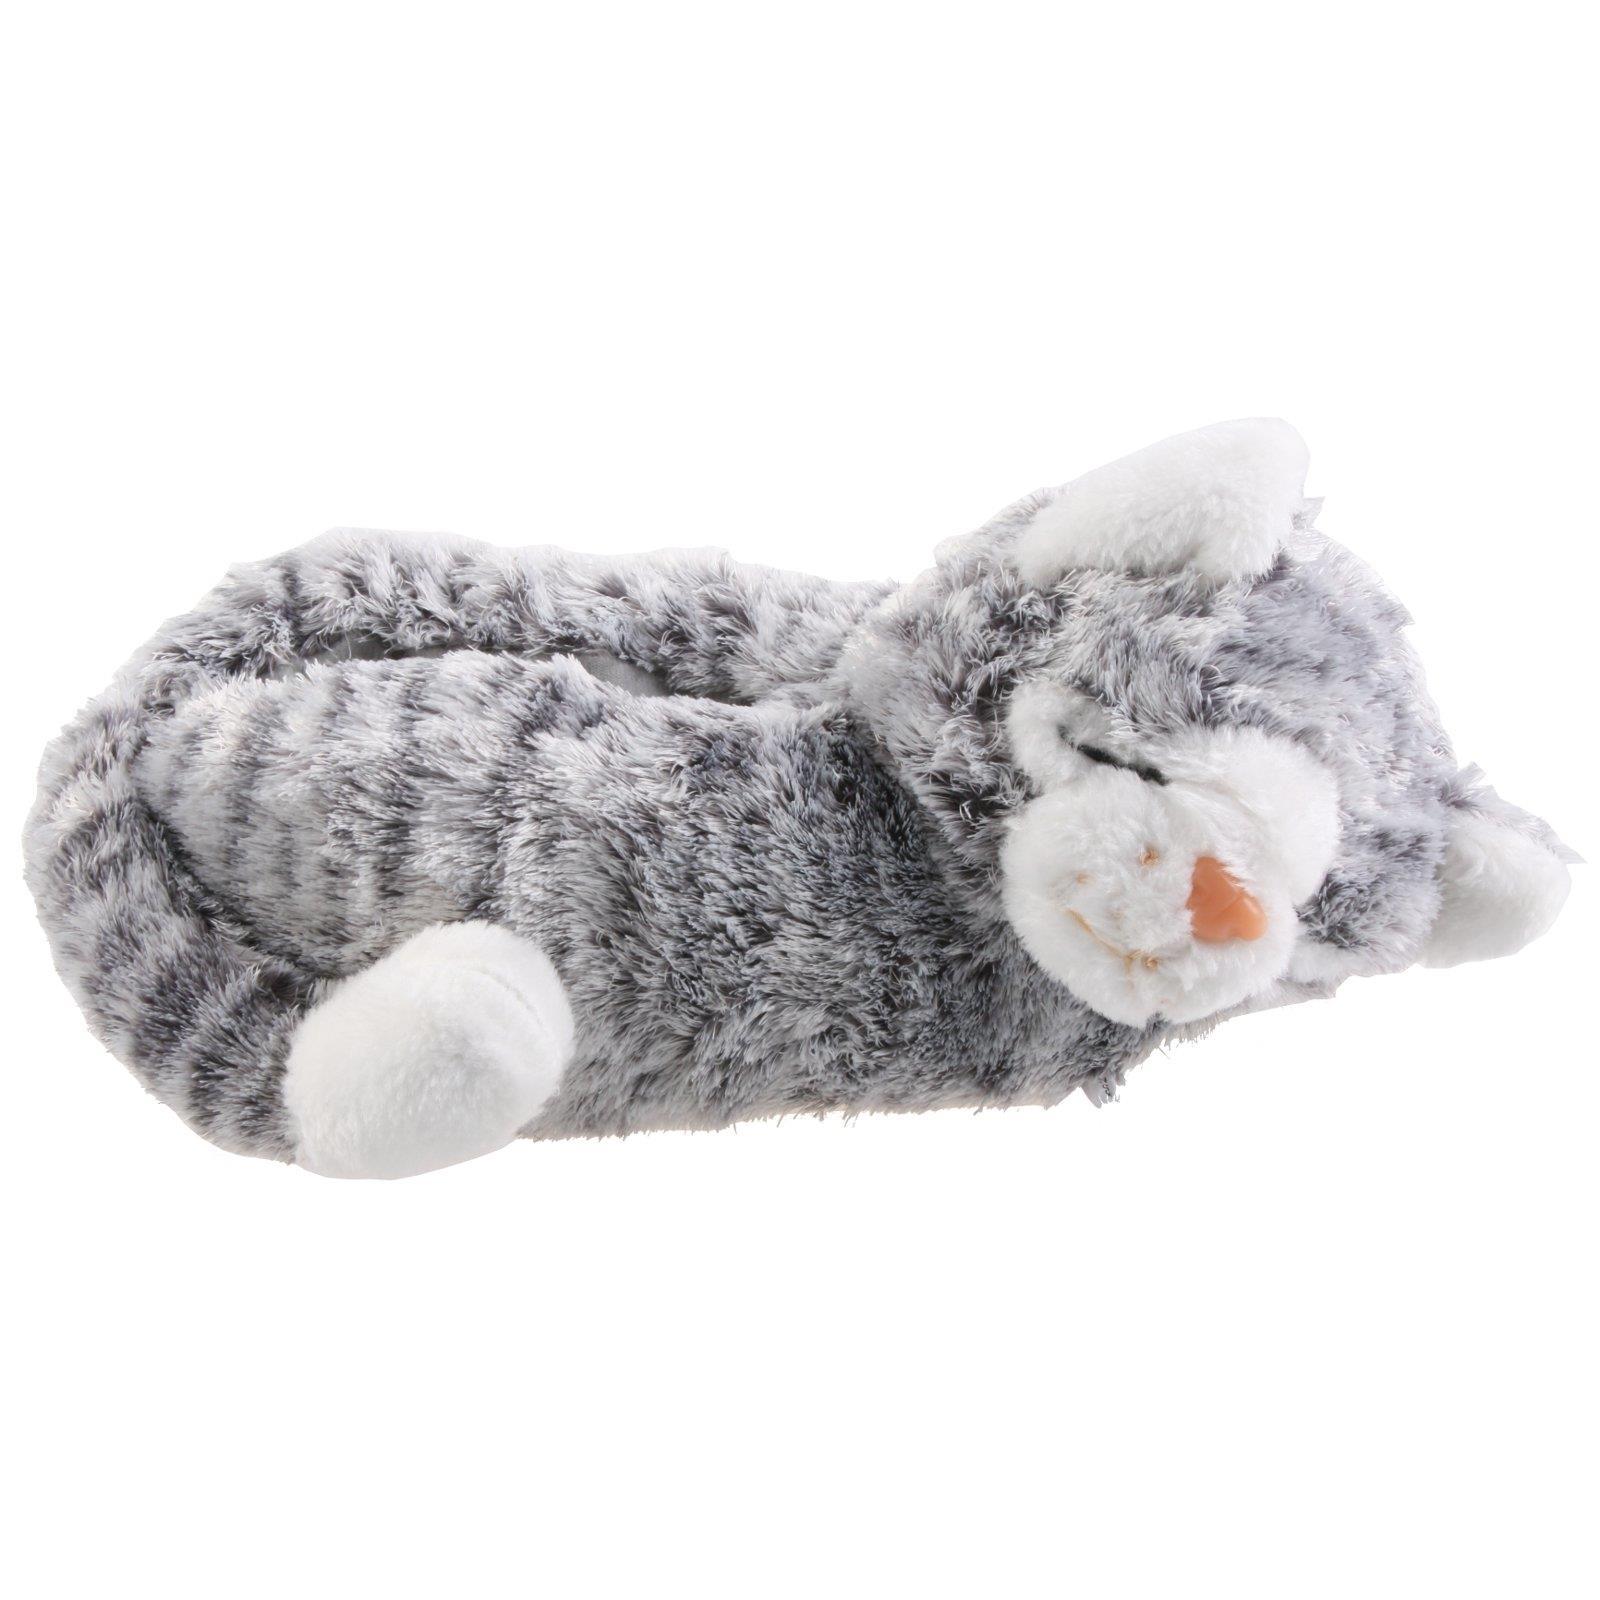 best sneakers 6fde4 efb81 Details zu Katze Tier Hausschuhe Pantoffel Schlappen Kuscheltier Plüsch  Damen Kinder 30-41